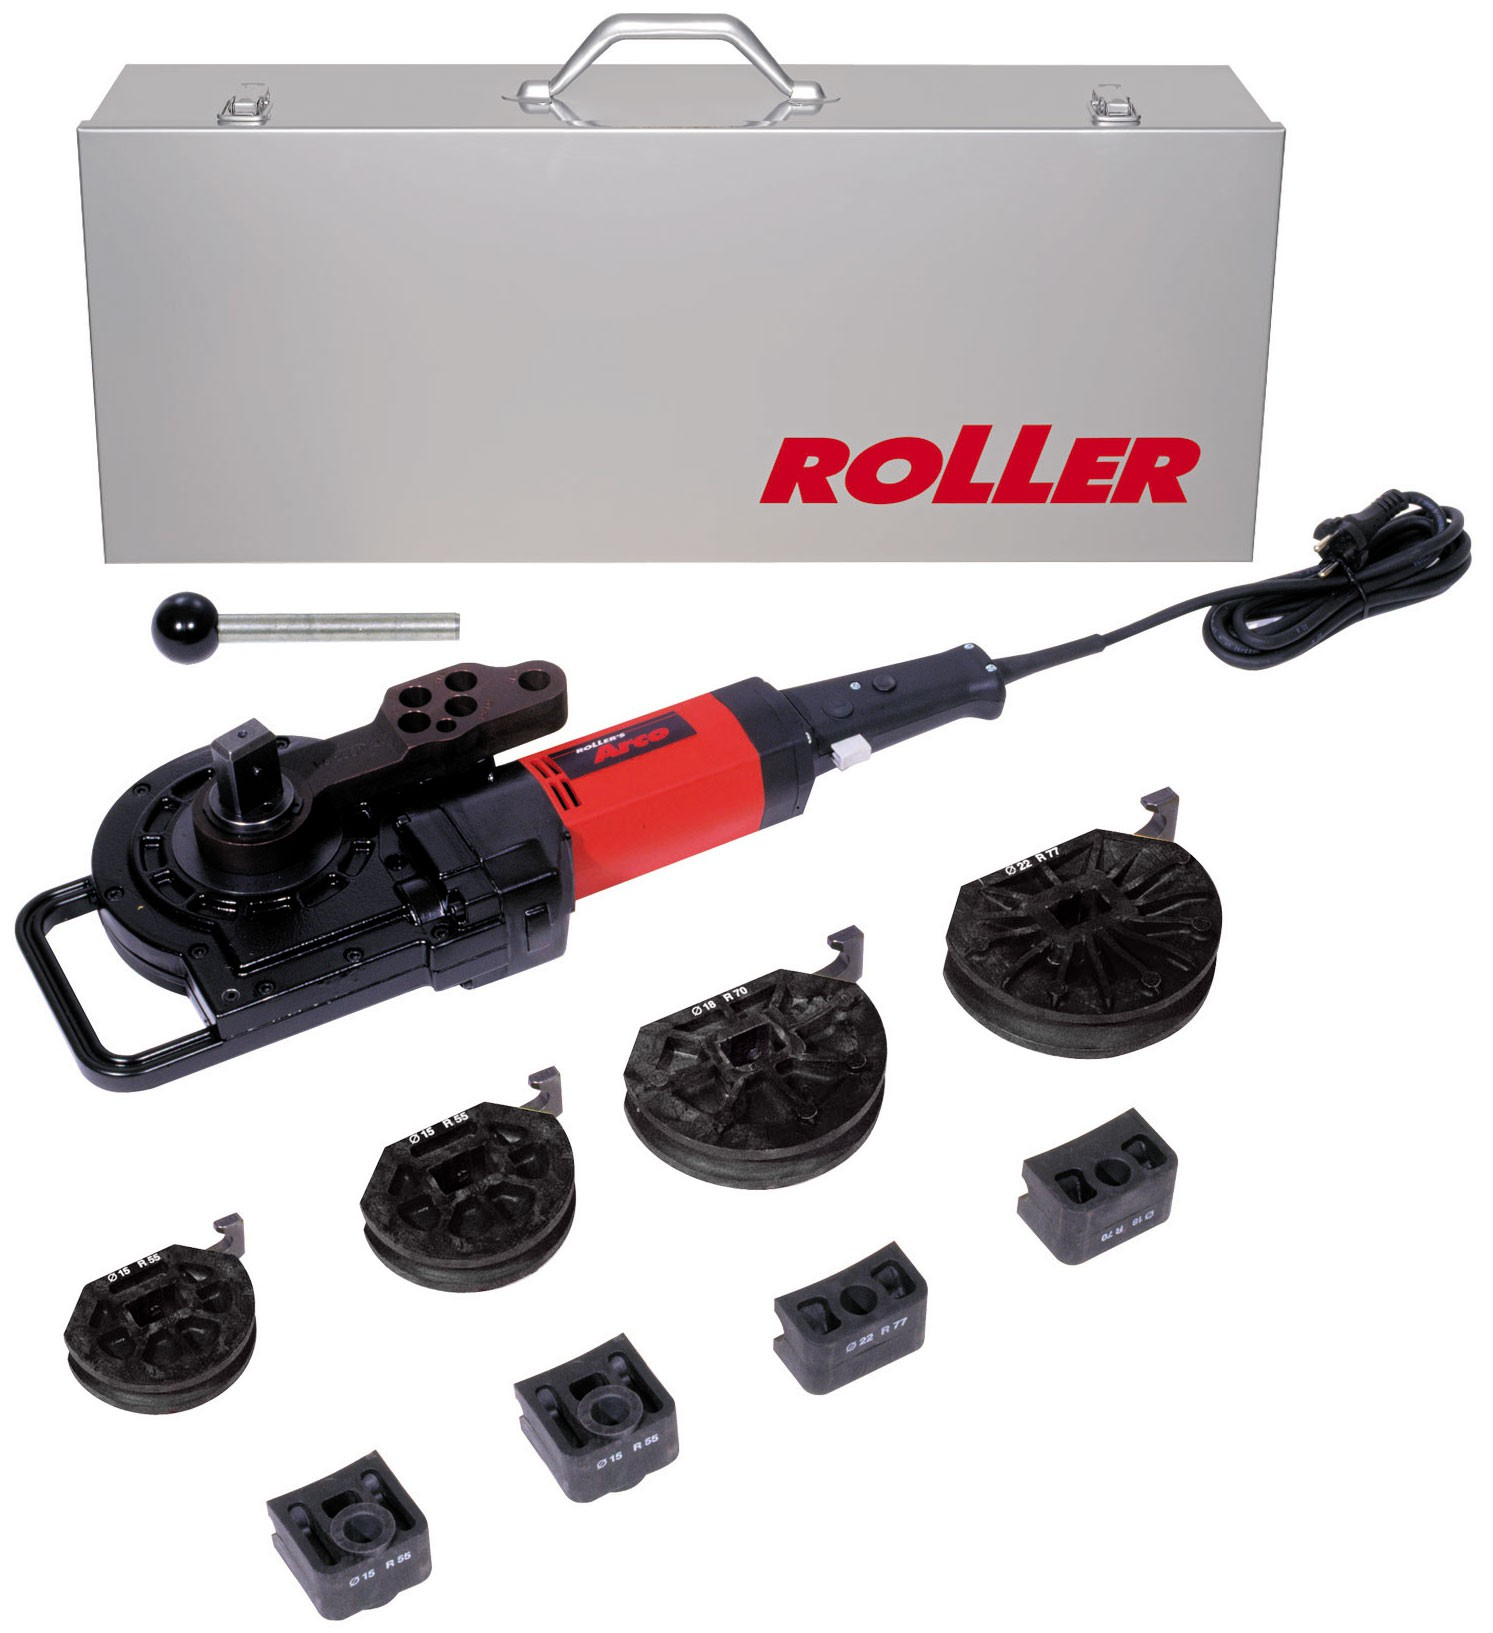 ROLLER'S Arco Set 15-18-22